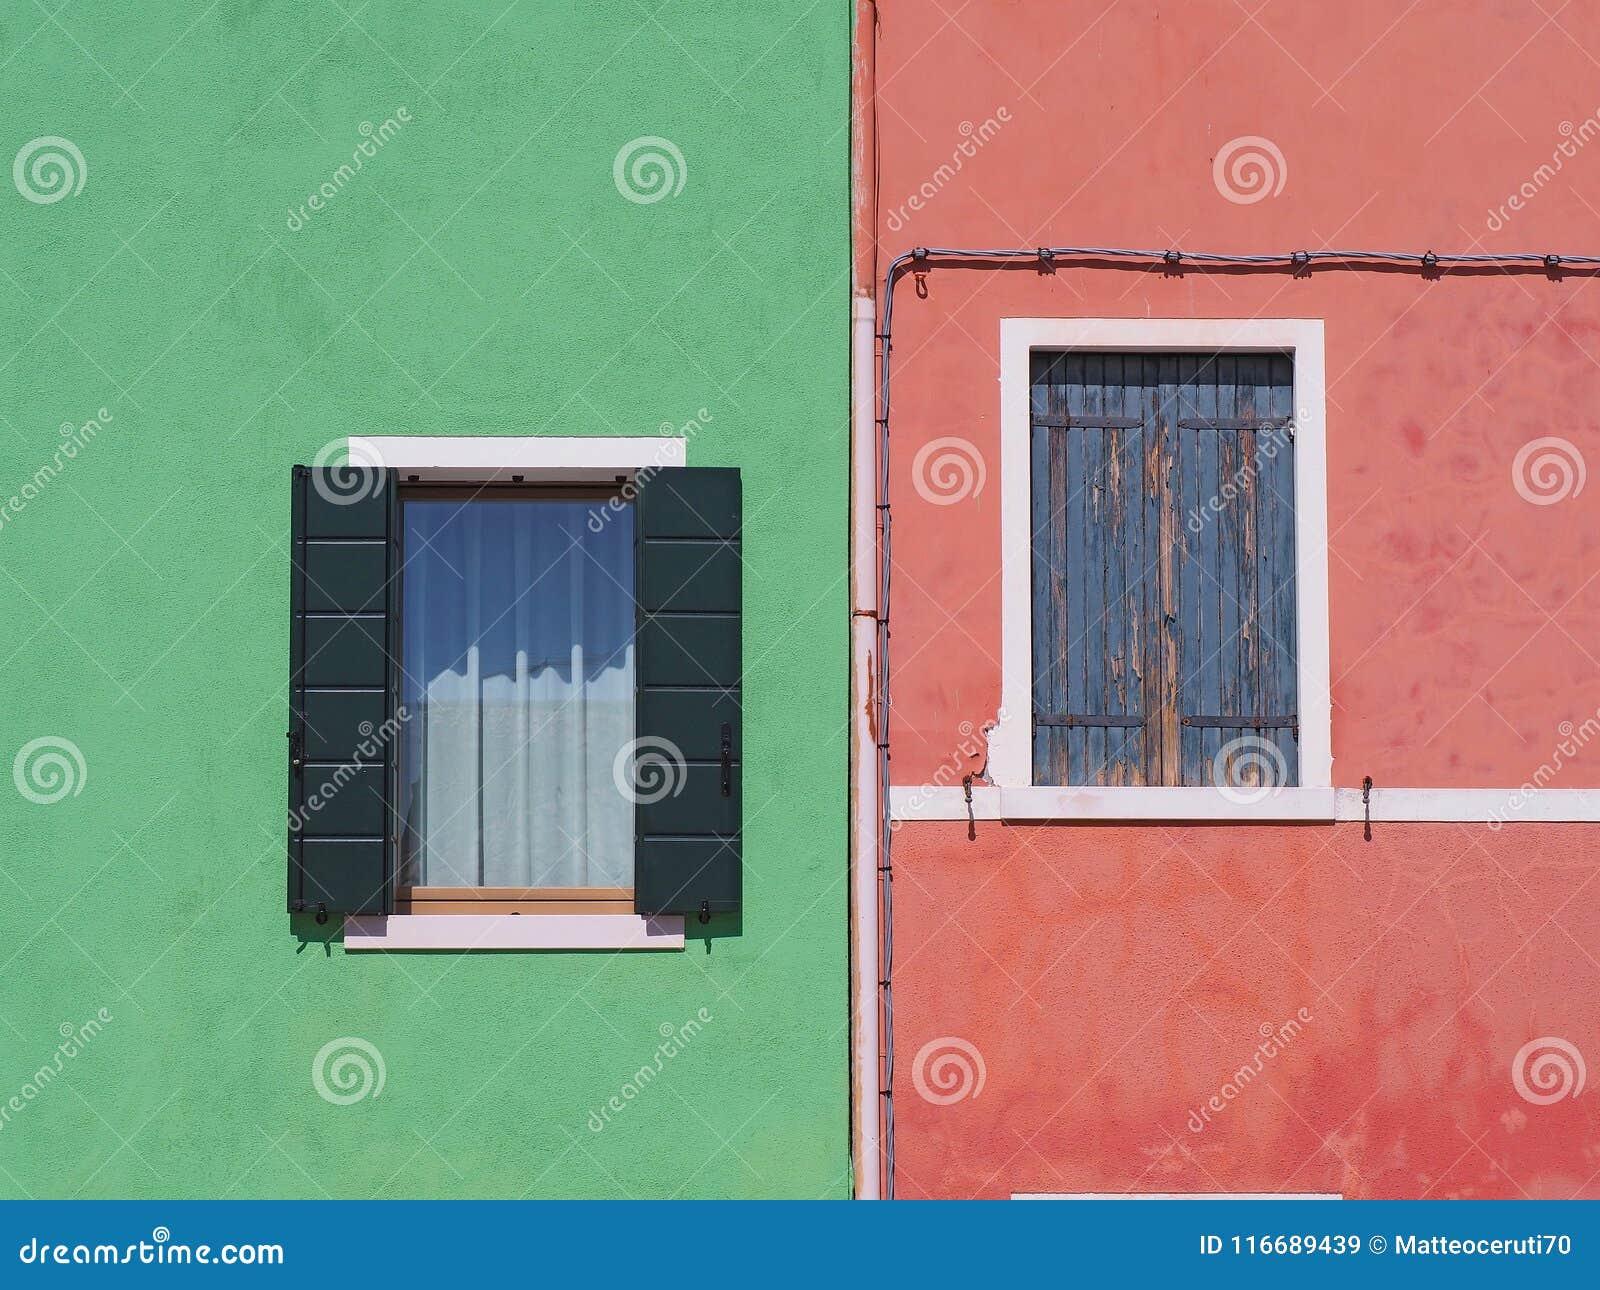 Burano, Venezia, Italien Details der Fenster der bunten Häuser in Burano-Insel